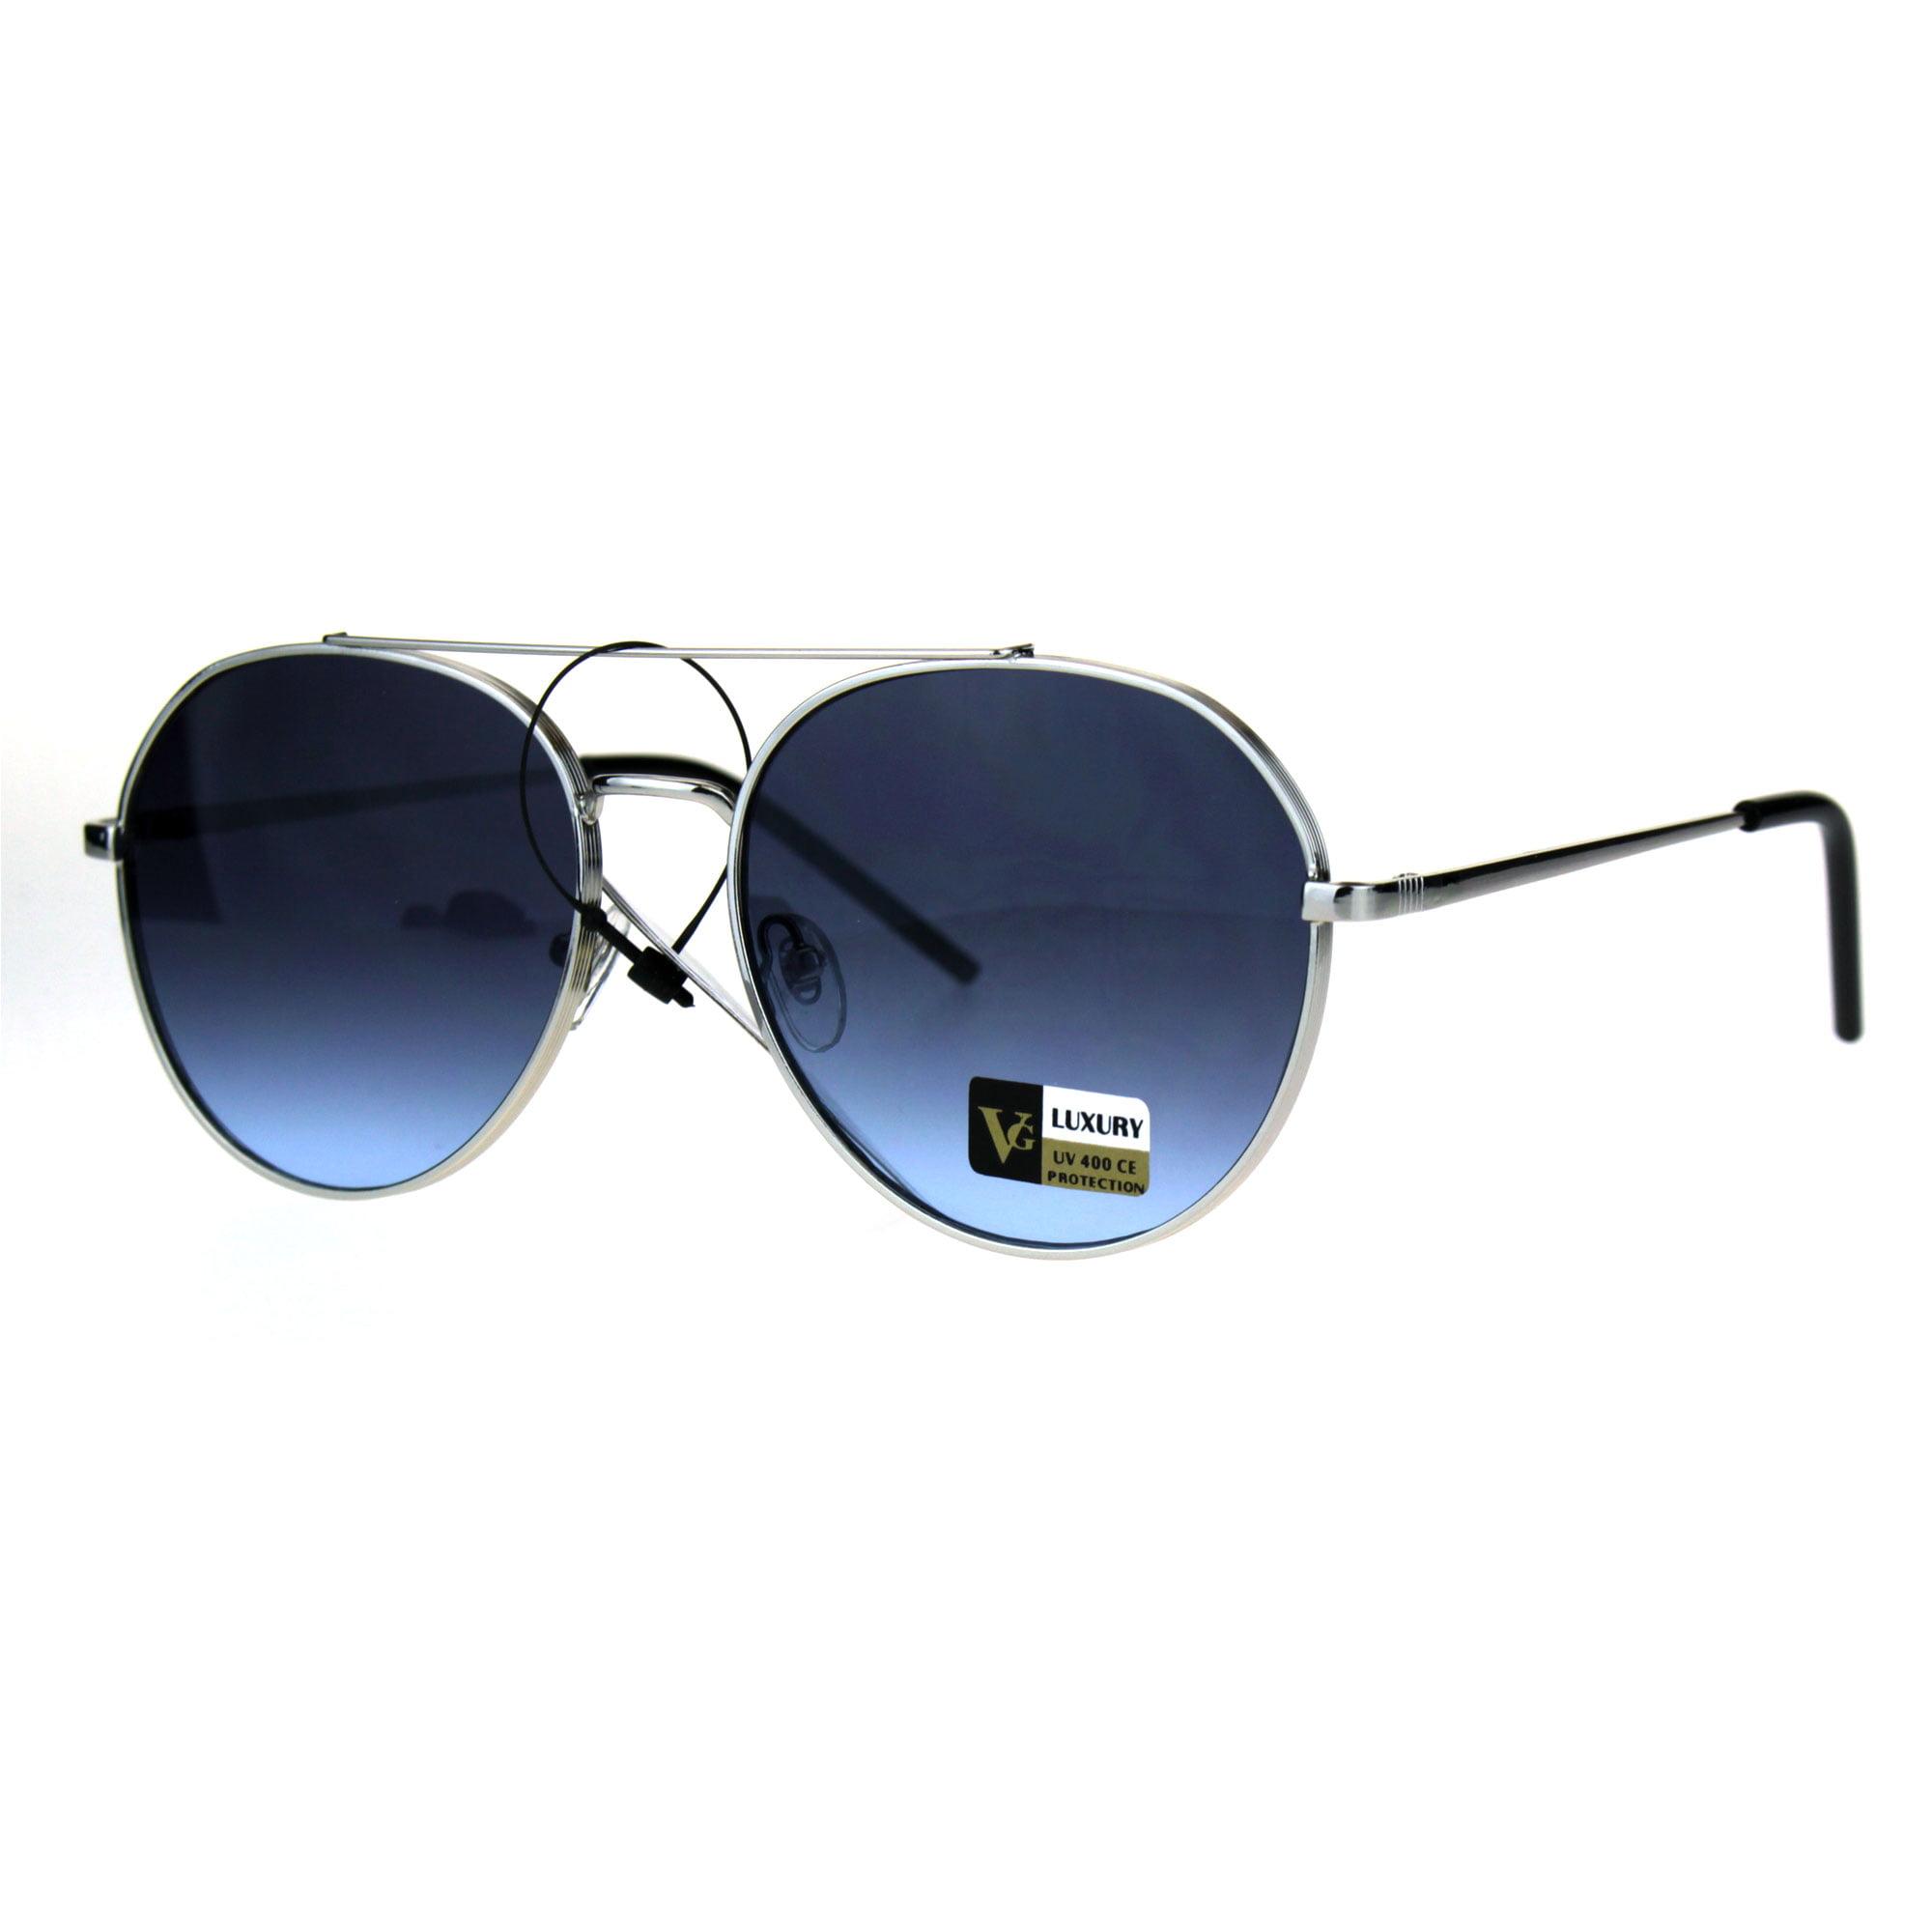 a7c13118eb3 Luxury Designer Fashion Metal Rim Aviator Flat Top Bar Sunglasses Black Blue